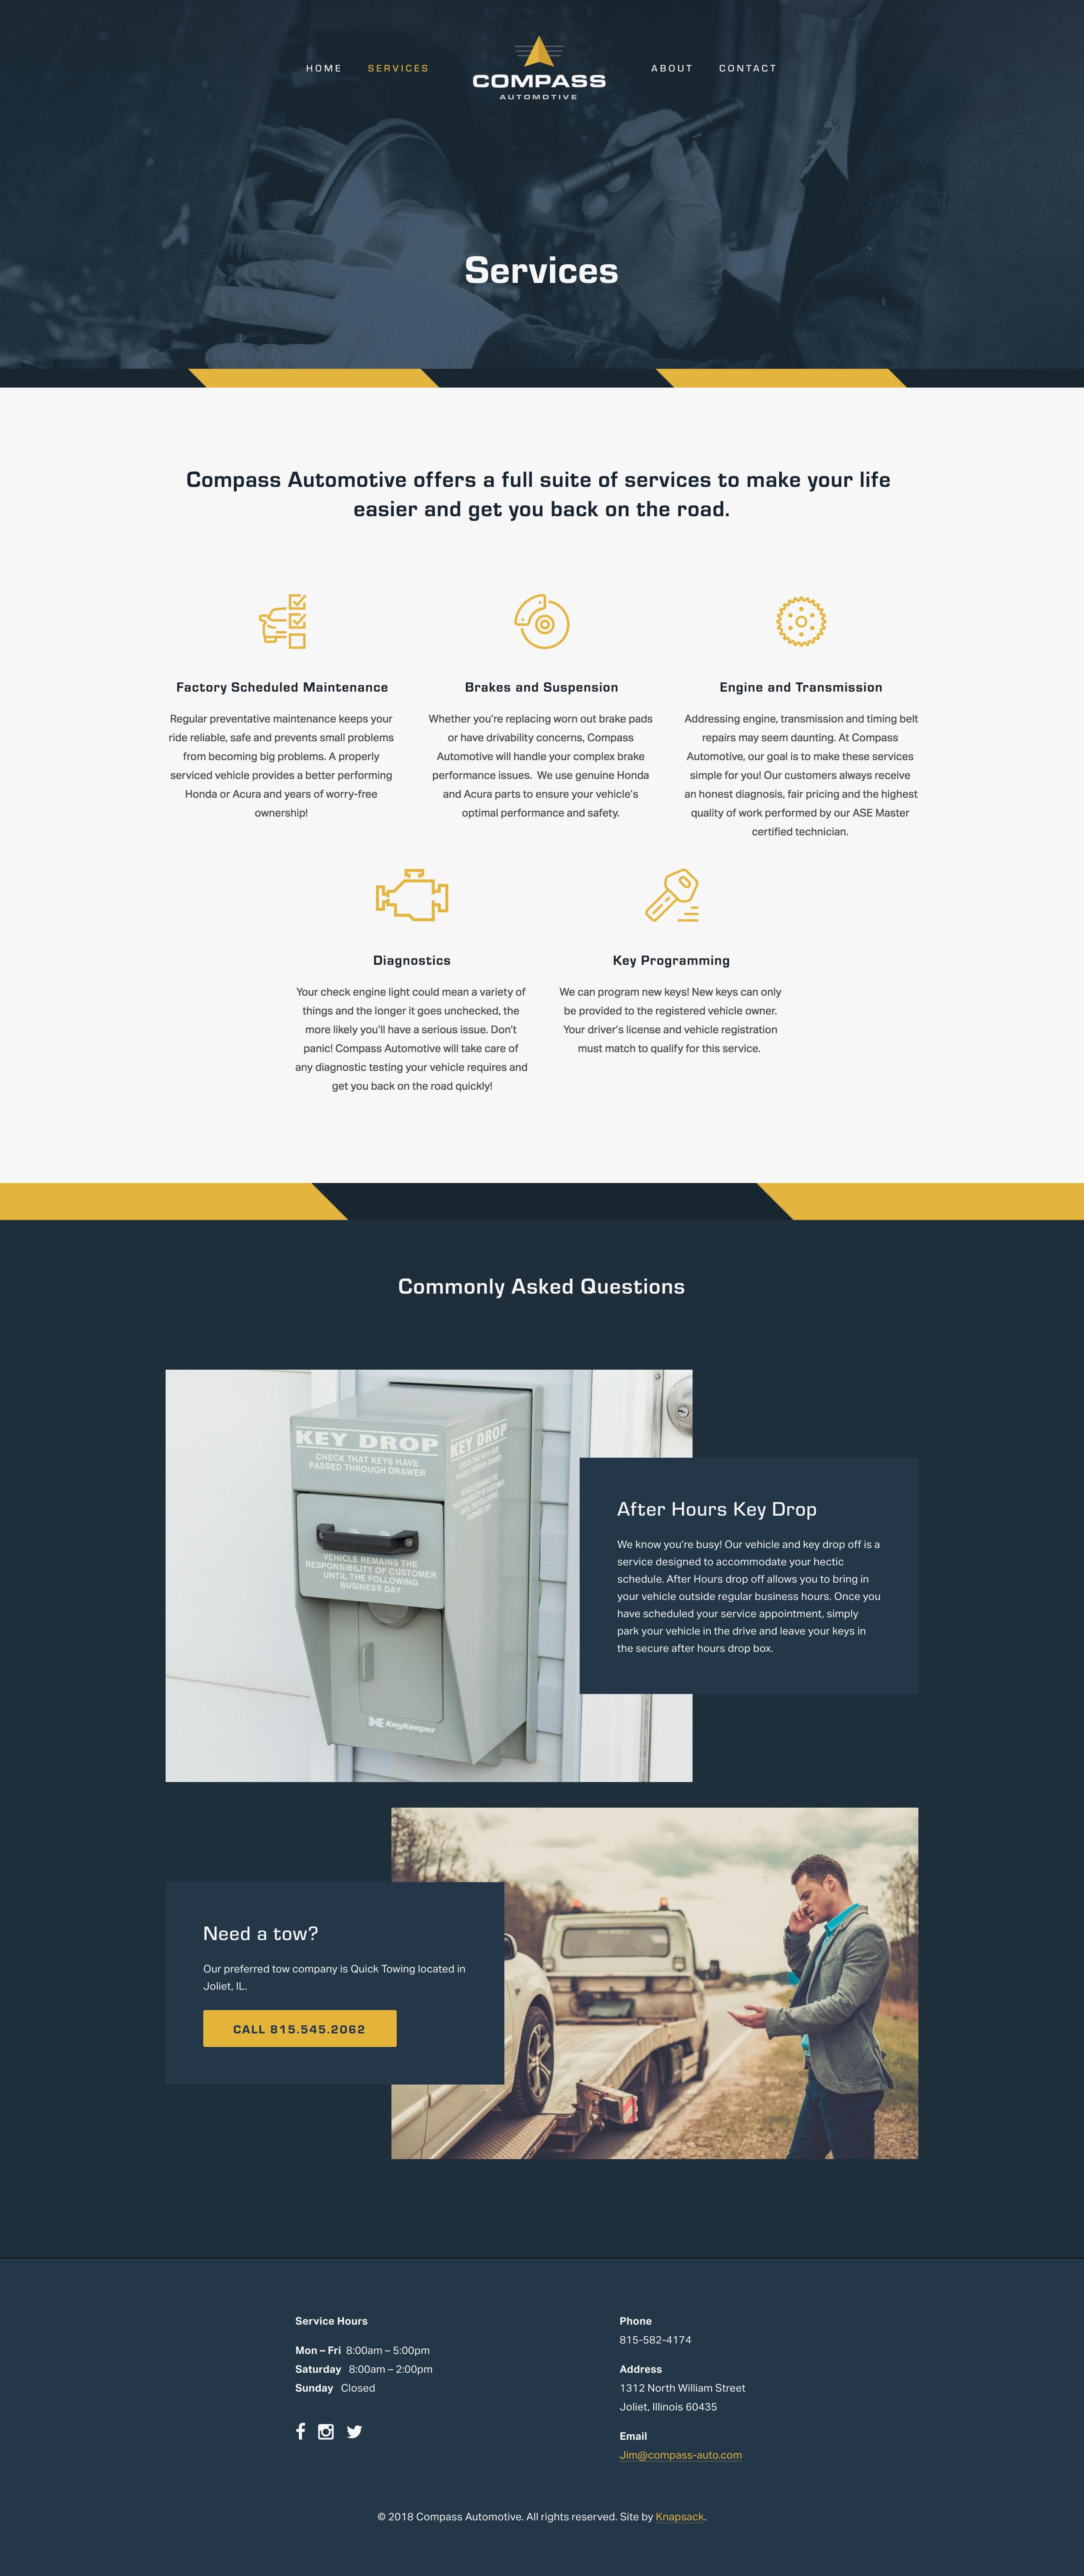 Compass-Automotive-Services-Macbook-Overlay.jpg